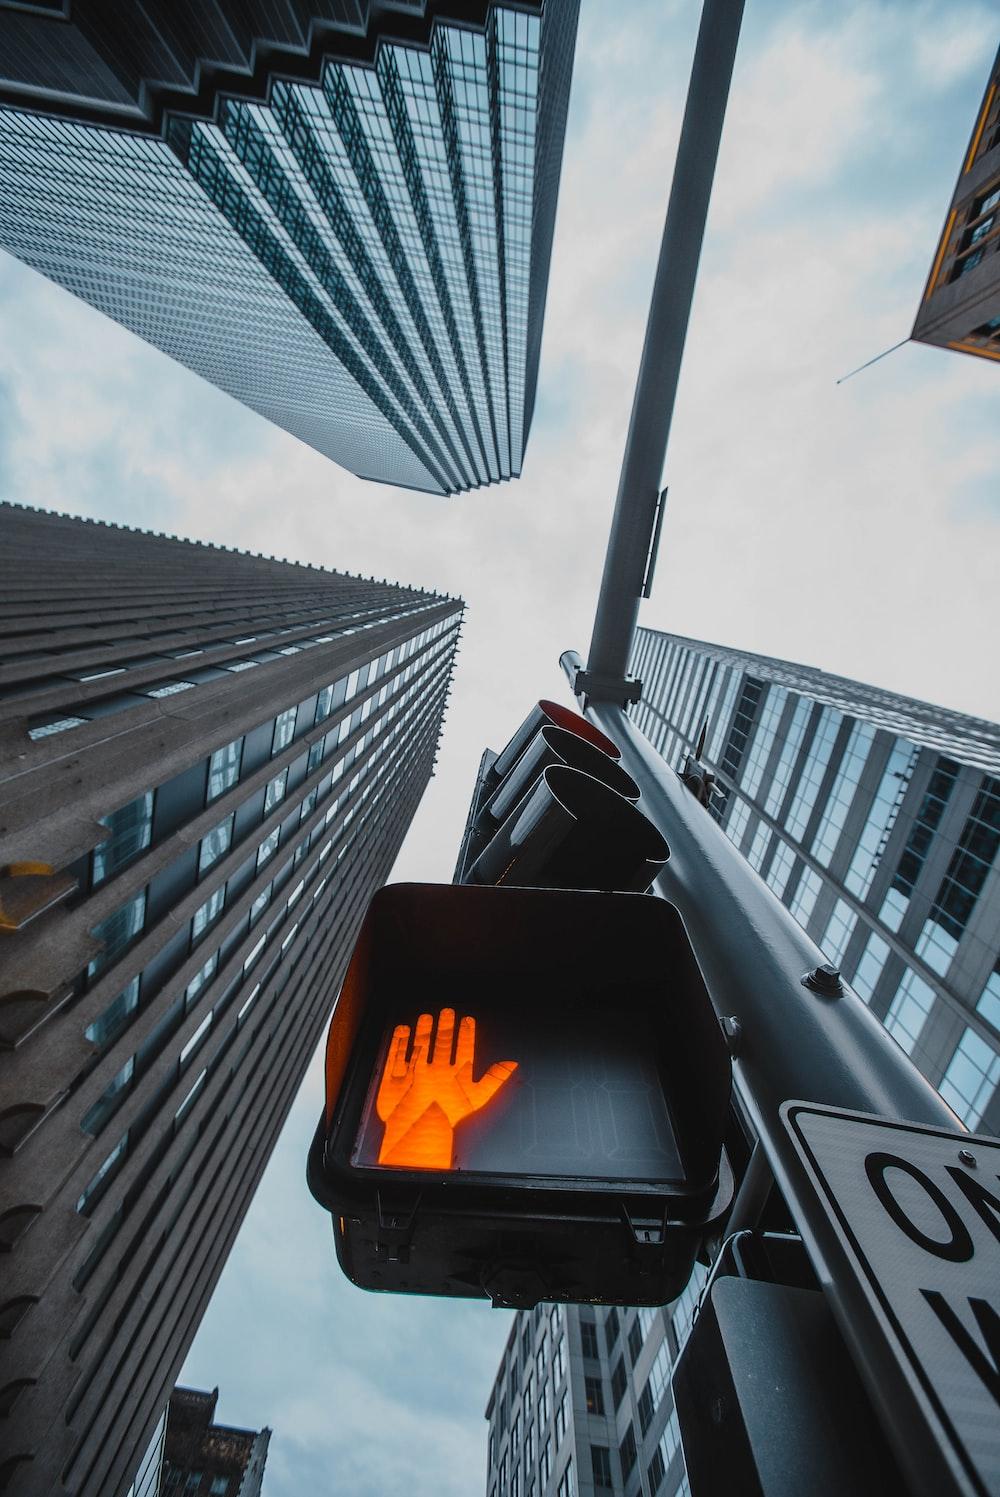 black and orange traffic light